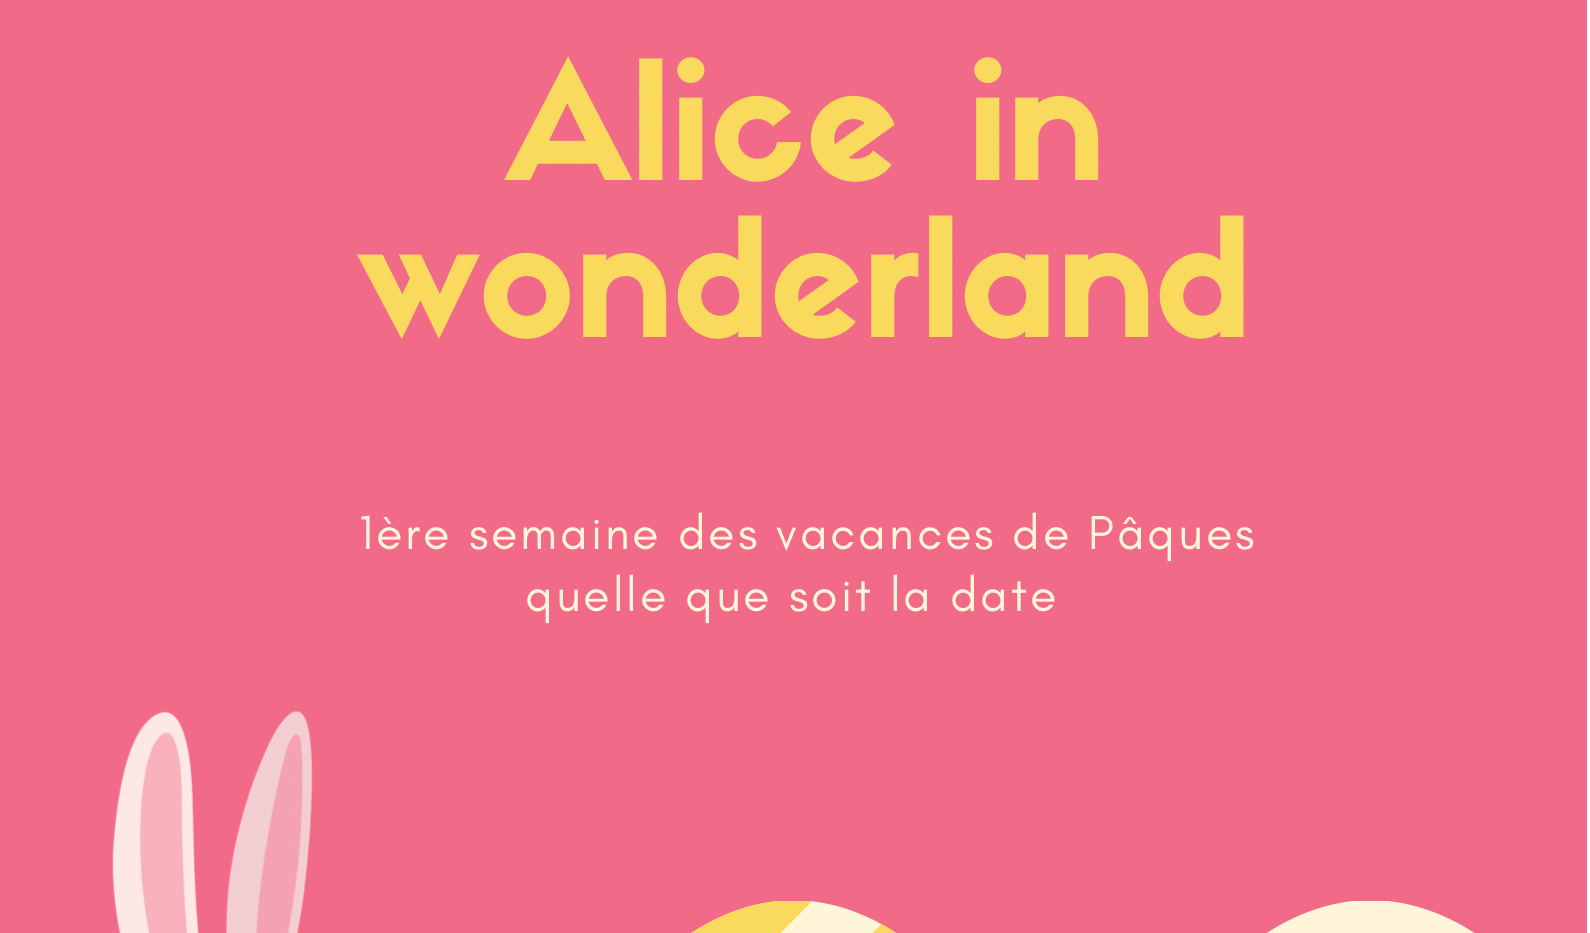 Alice in Wonderland 1st week